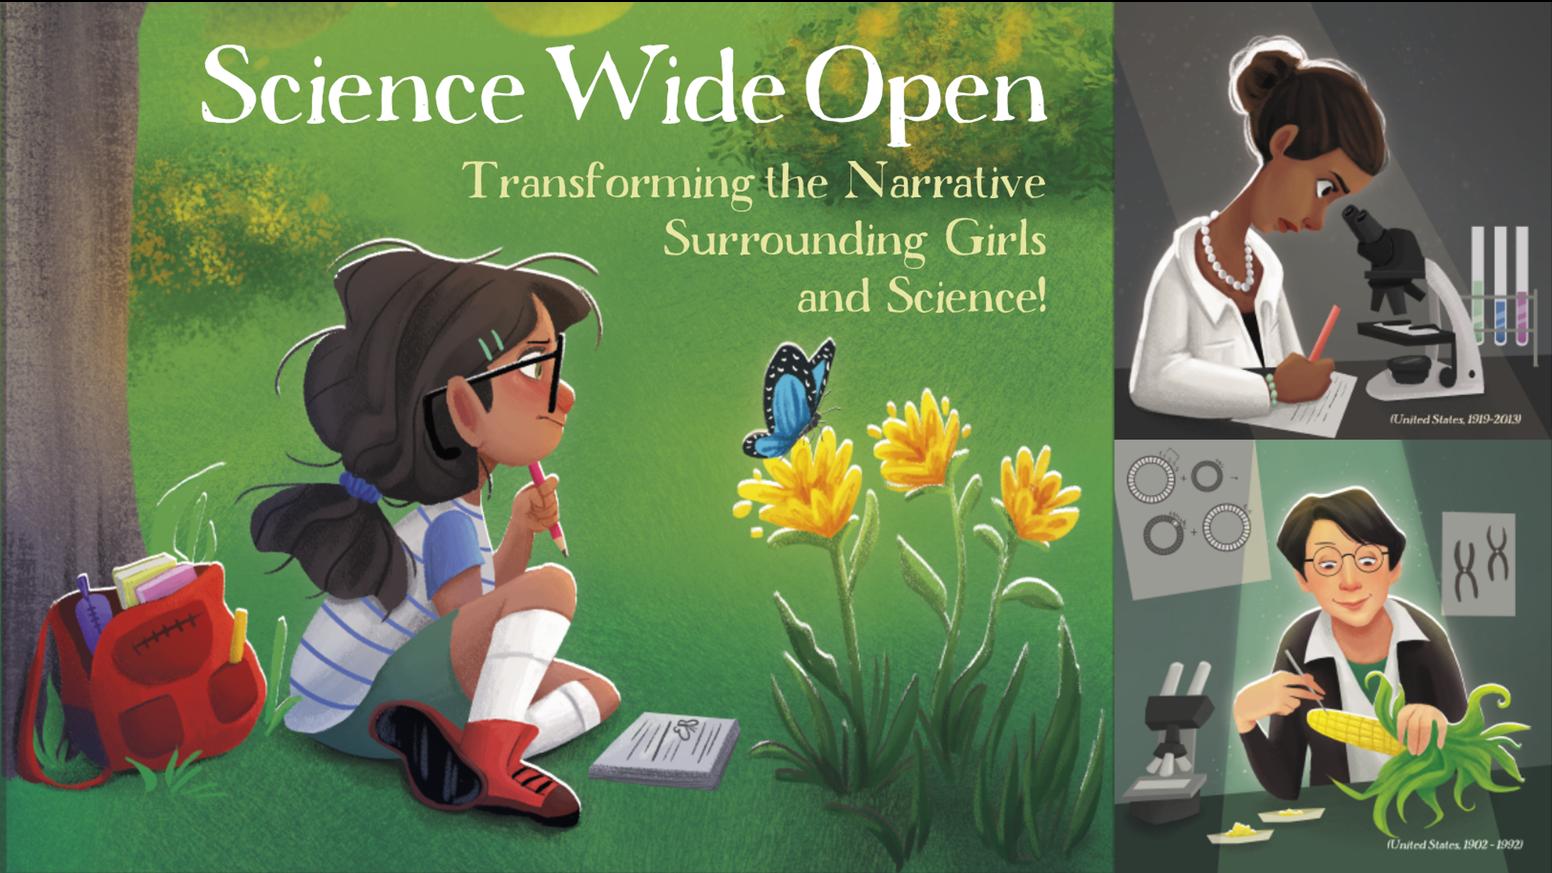 science wide open header.png